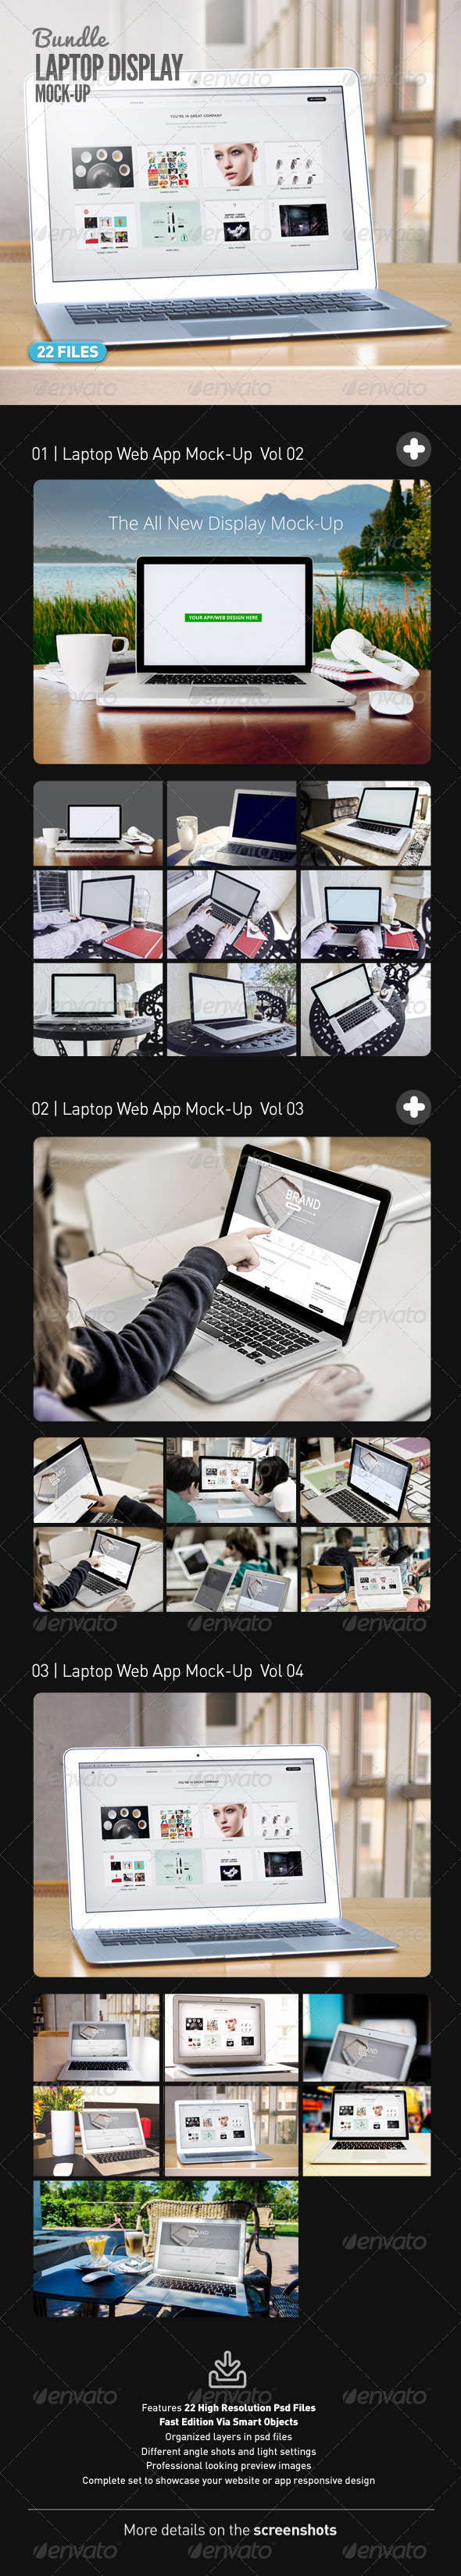 Laptop | Web App Mock-Up Bundle - Displays Product Mock-Ups